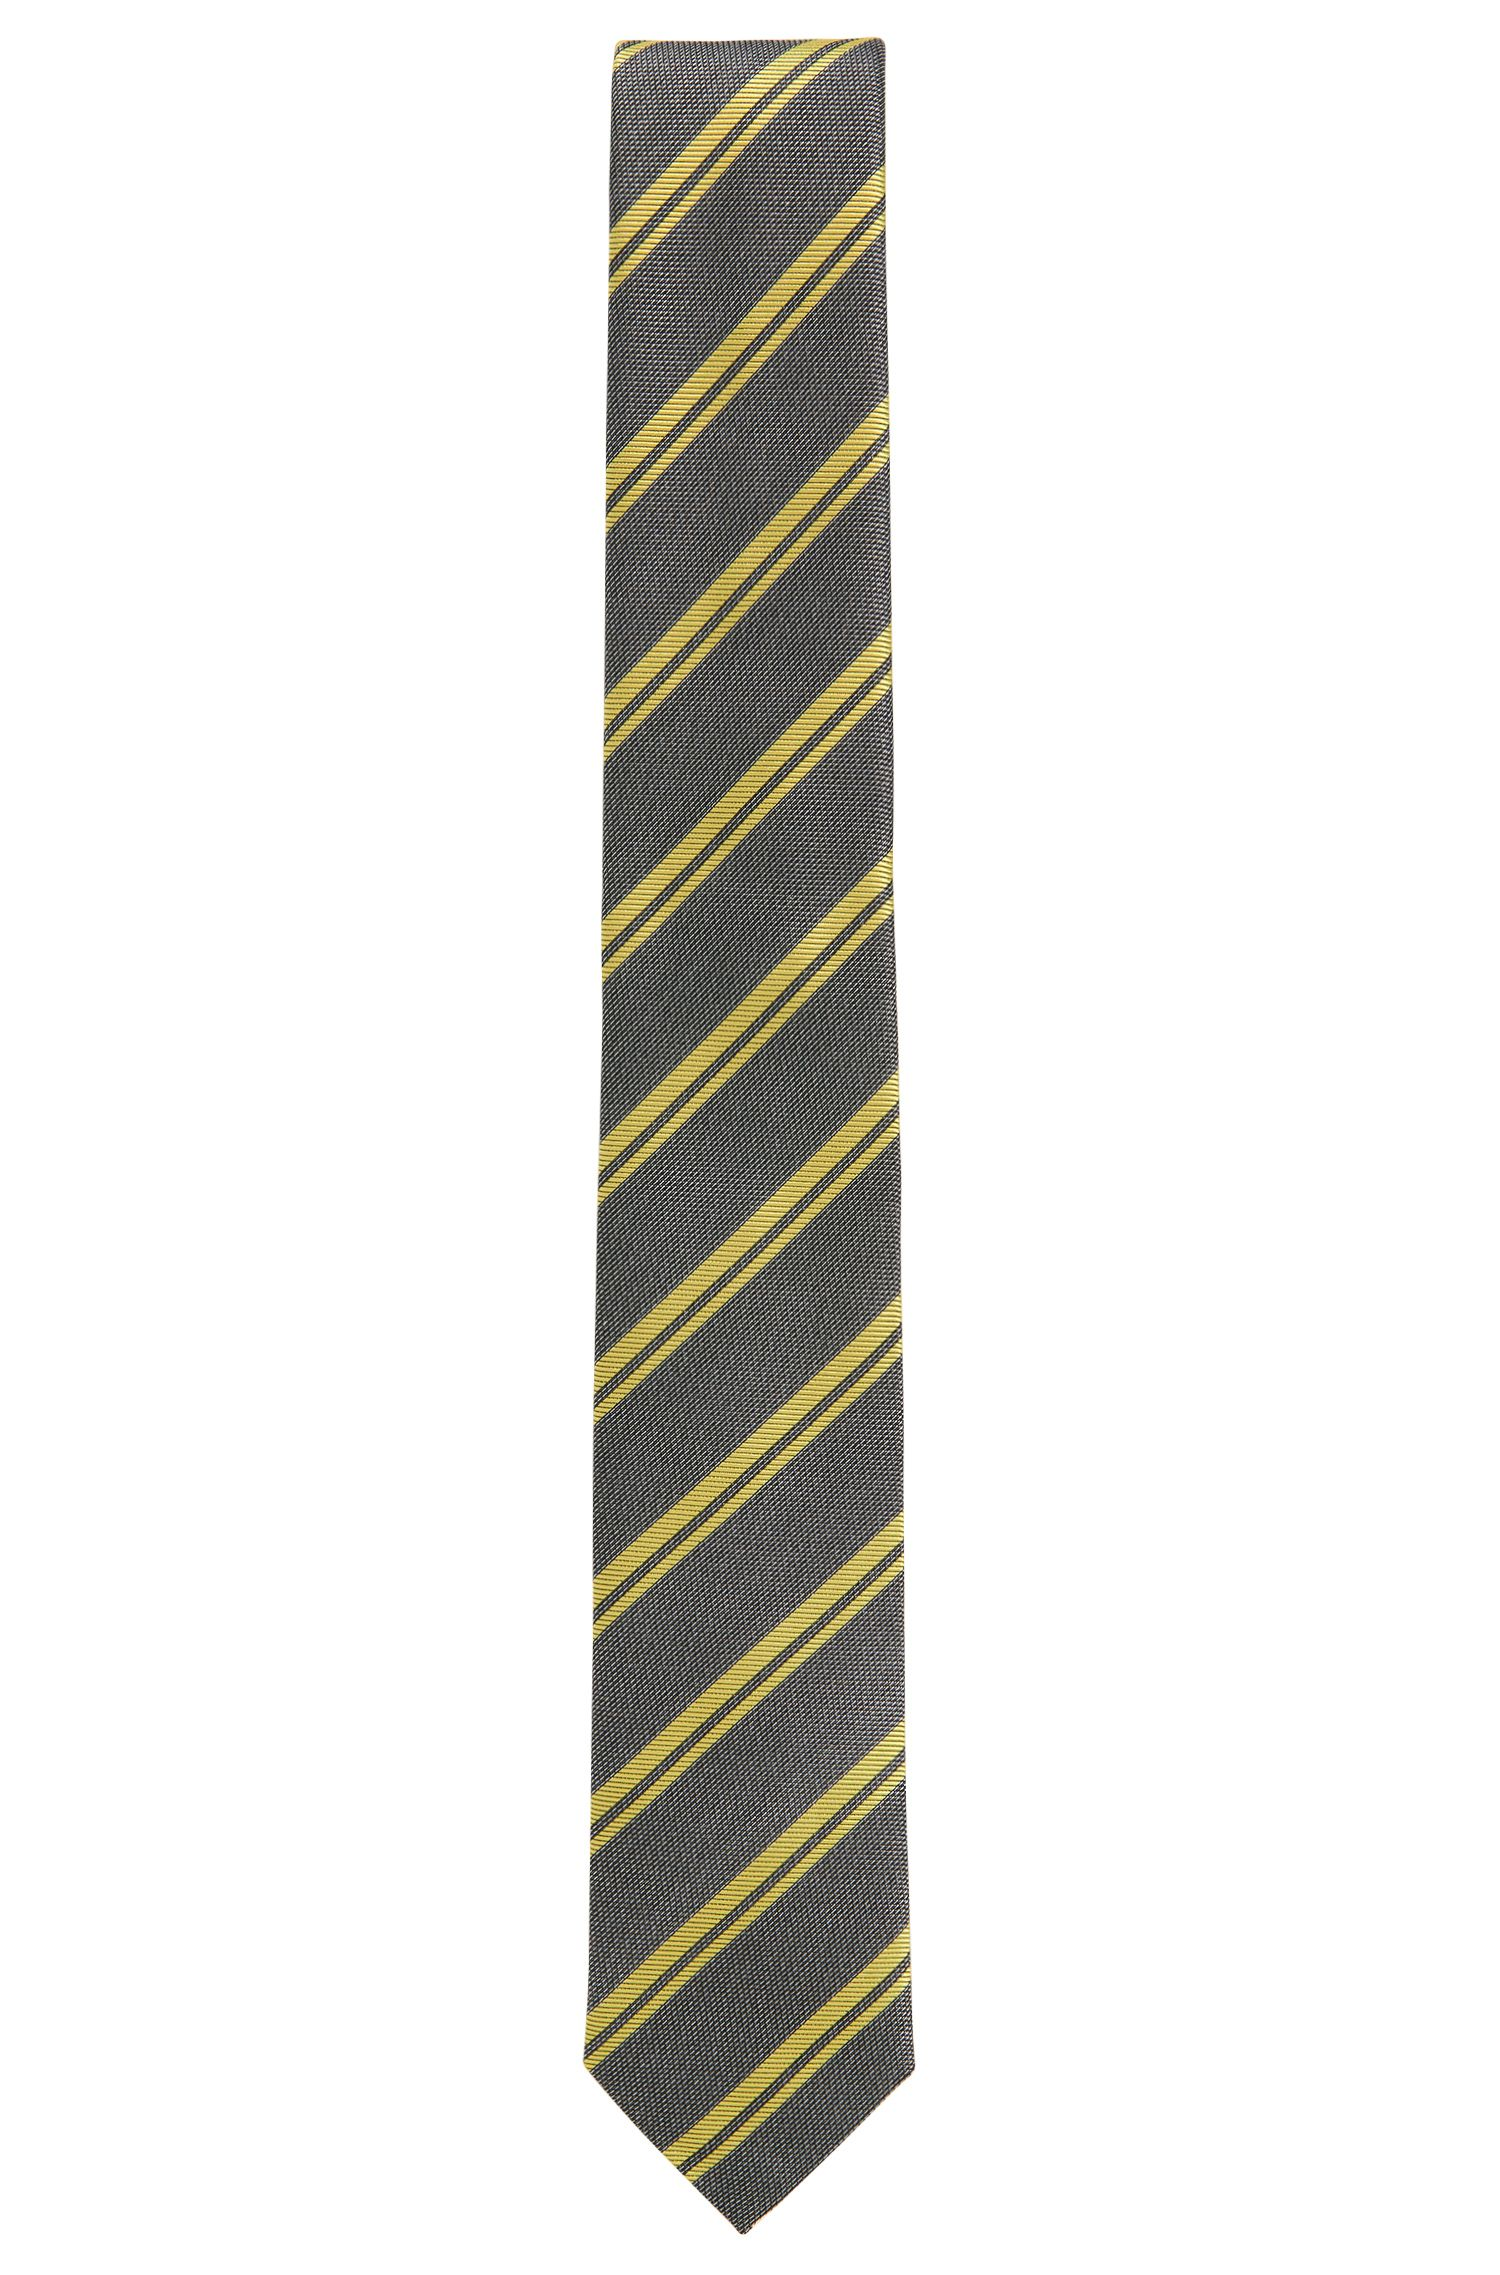 'T-Tie 6 cm'   Slim, Striped Italian Silk Tie